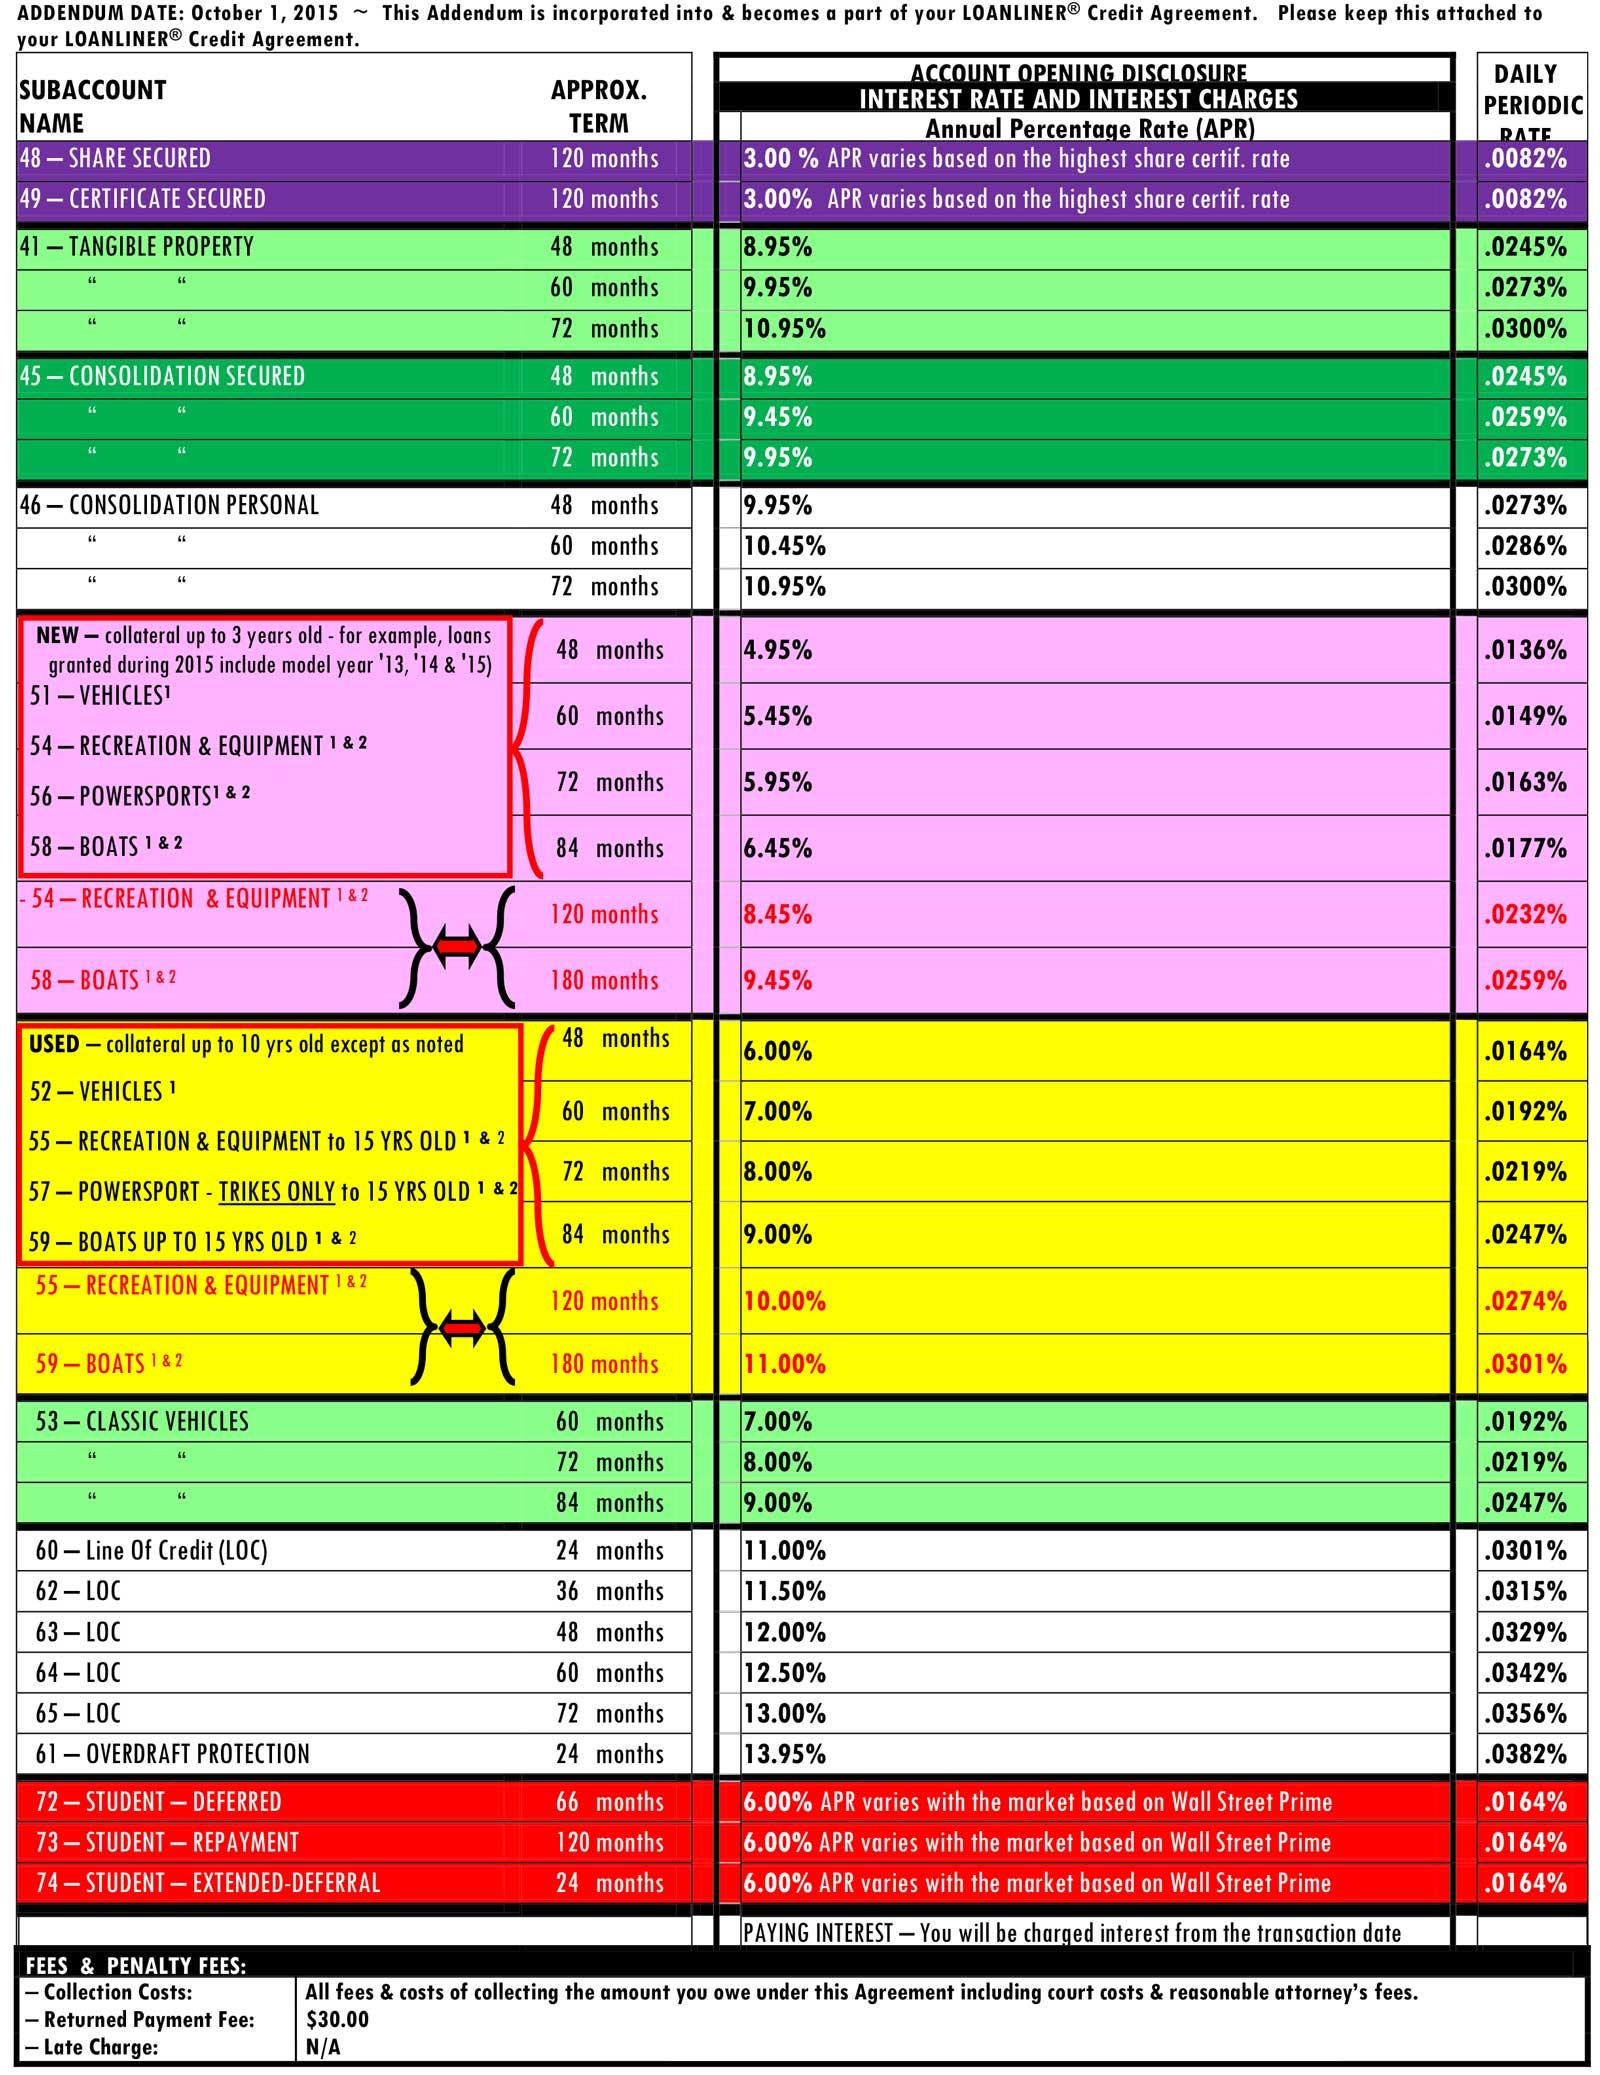 PCFCU-Loan-Rates